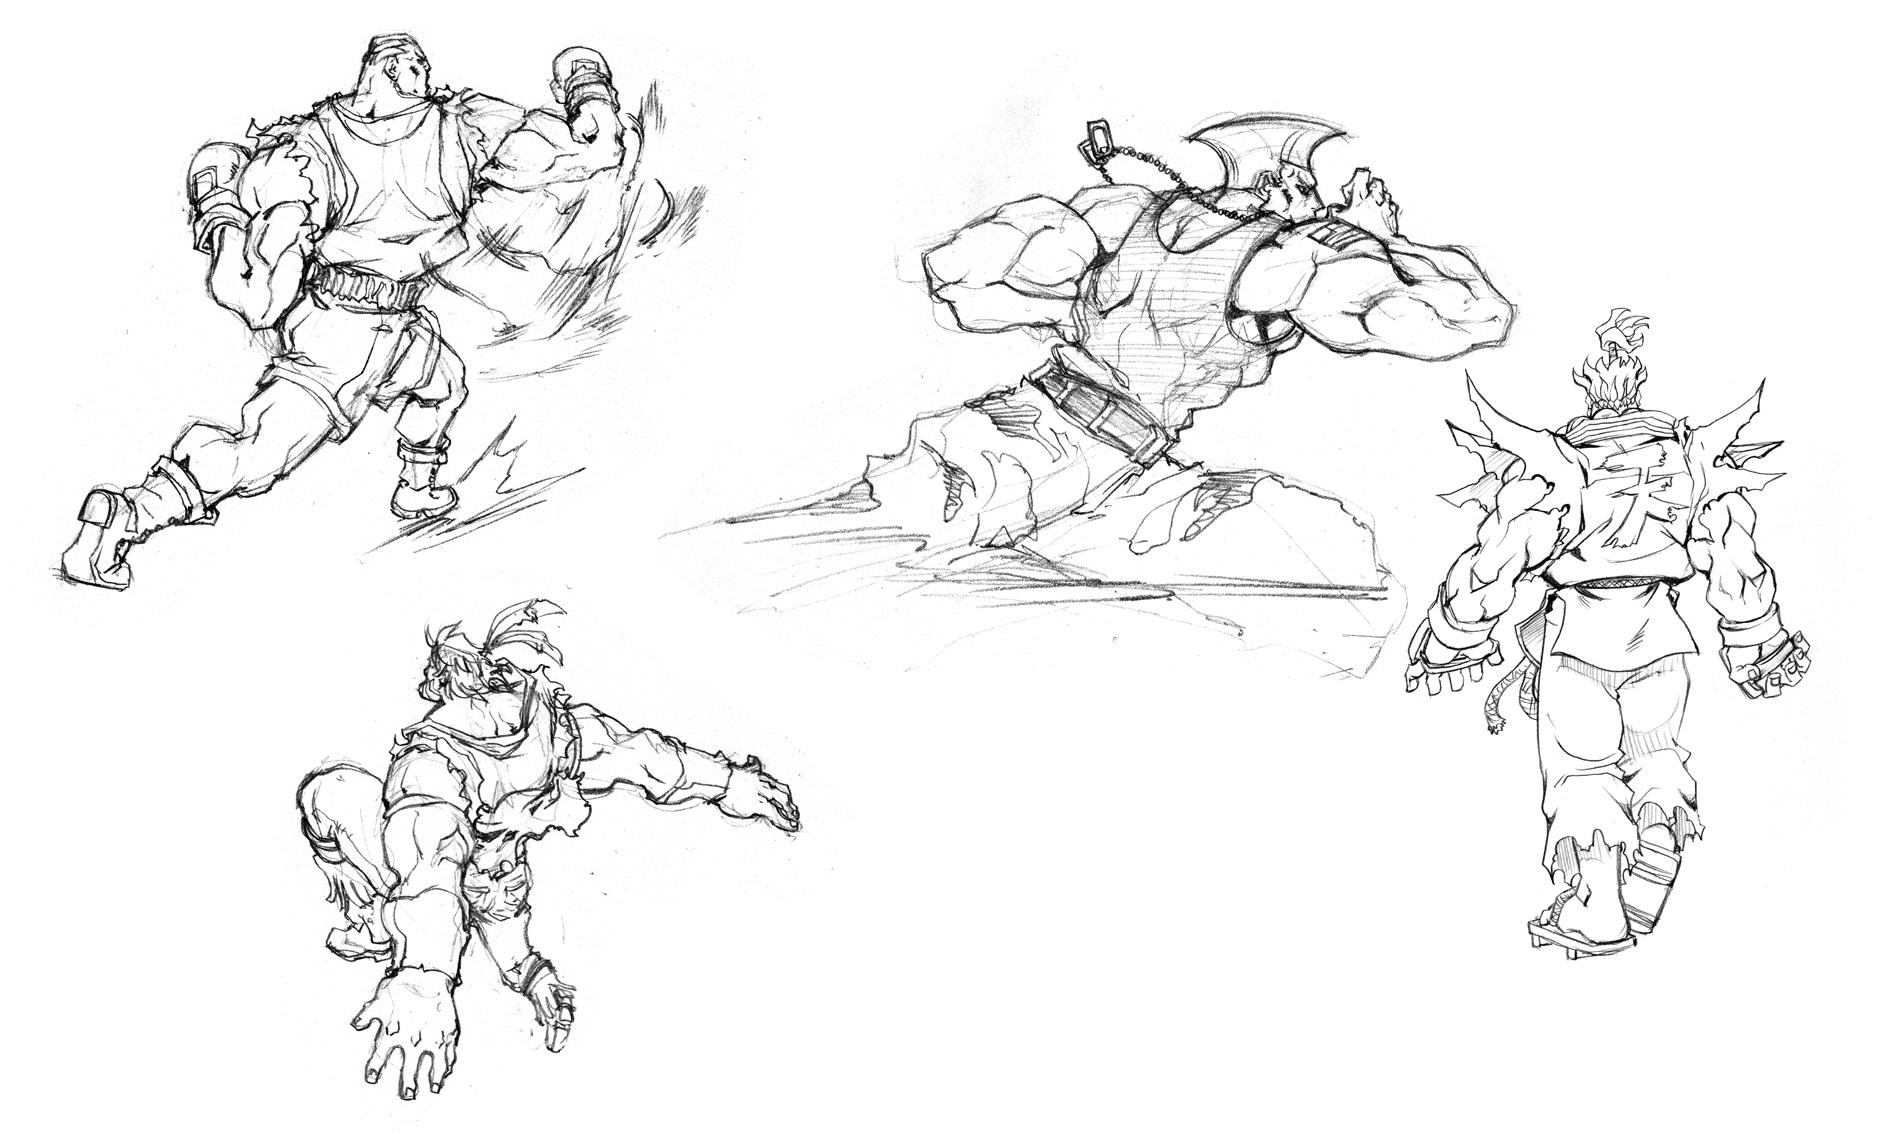 Street Fihter, Skitse, Courtesy Of Capcom